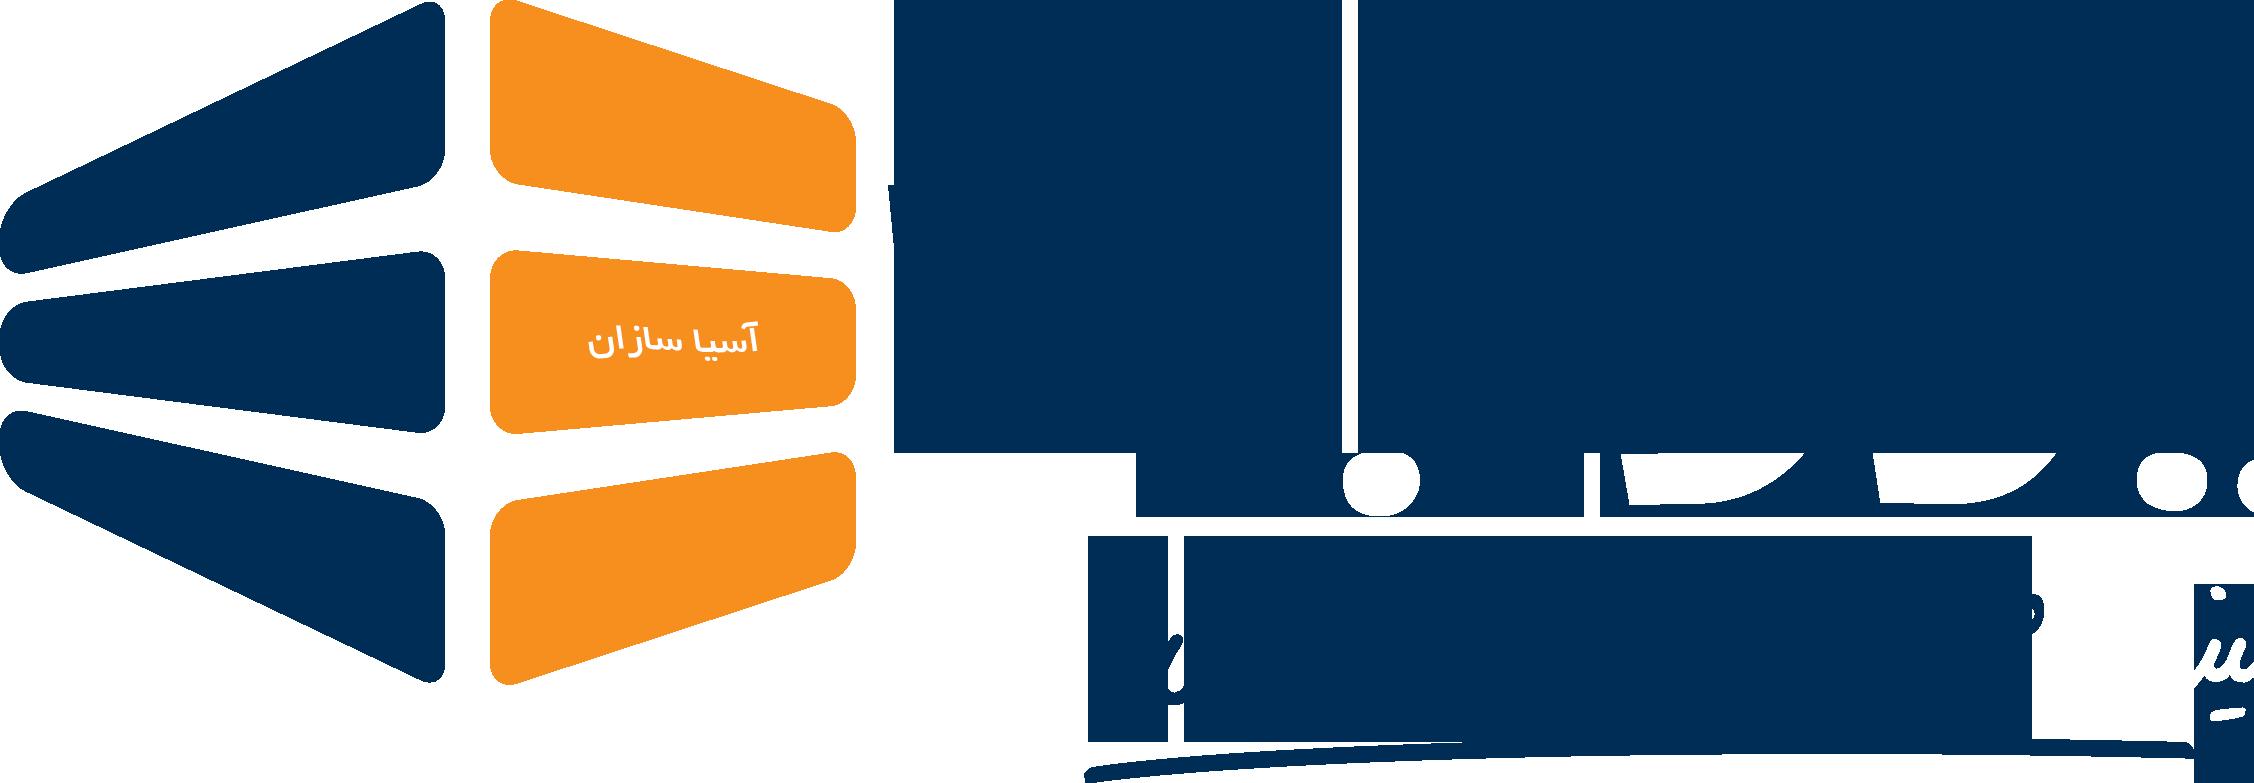 logo_leaseweb_nieuw1